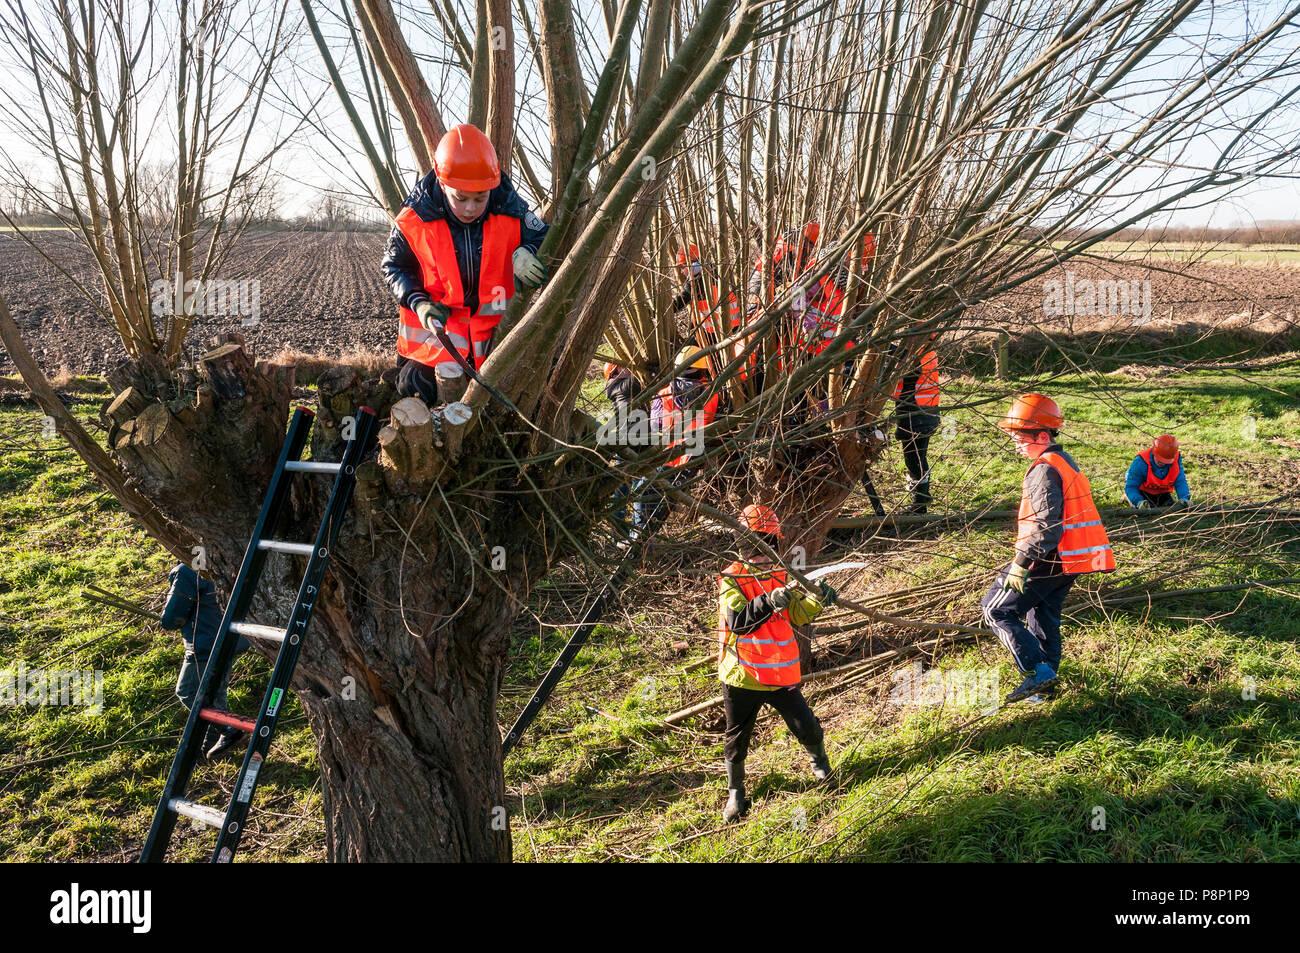 Children help with Pollarding willows. - Stock Image